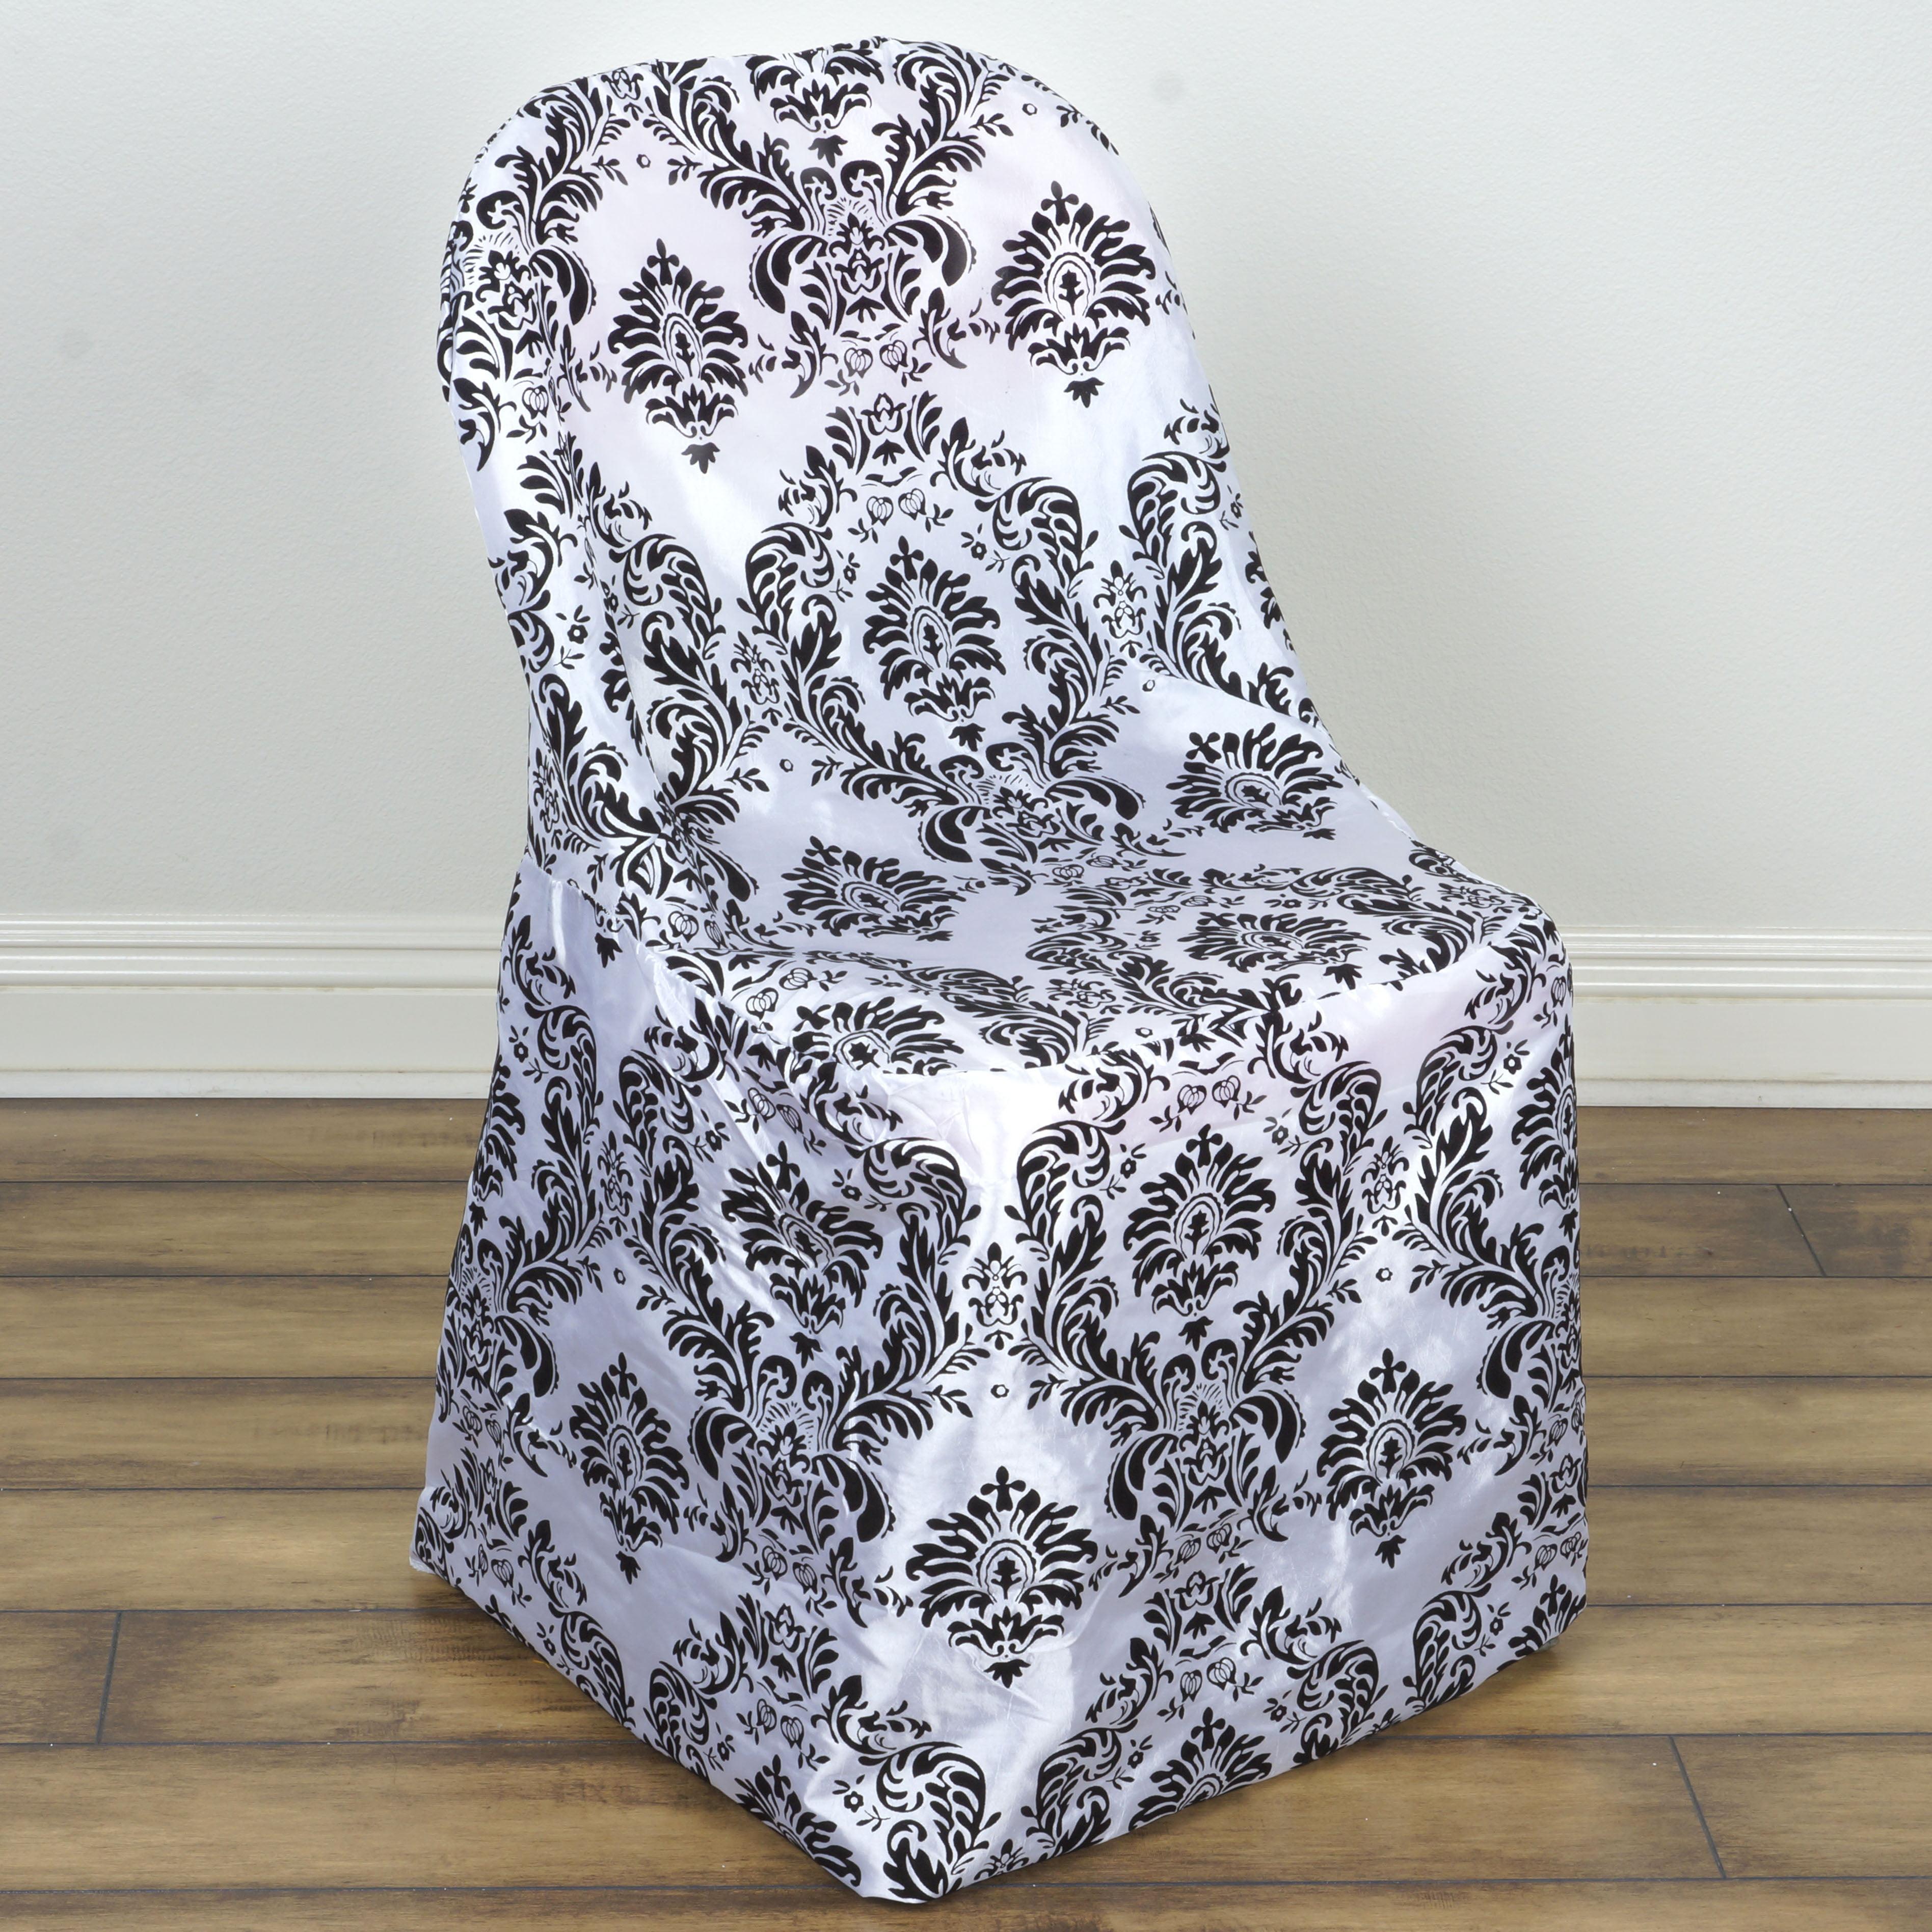 Balsacircle Black White Damask Flocking Folding Chair Cover Party